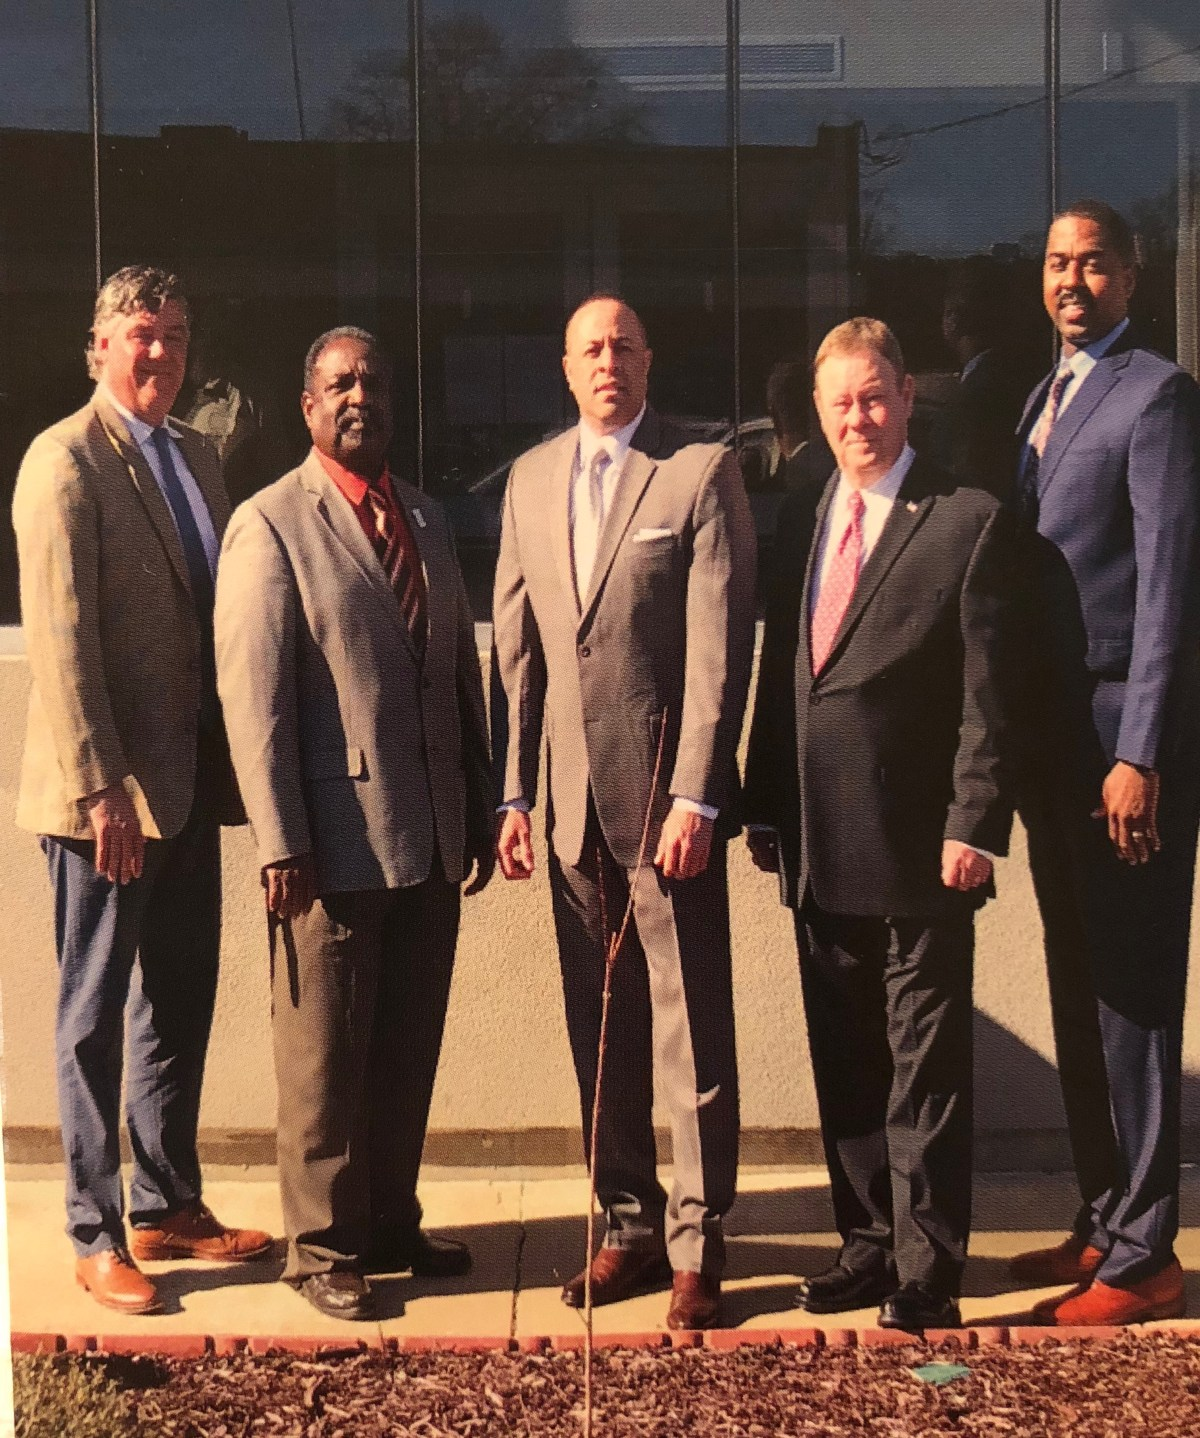 Ken Murphy, Ed Seals, Chuck Espy, Bo Plunk, and Willie Turner, Jr.